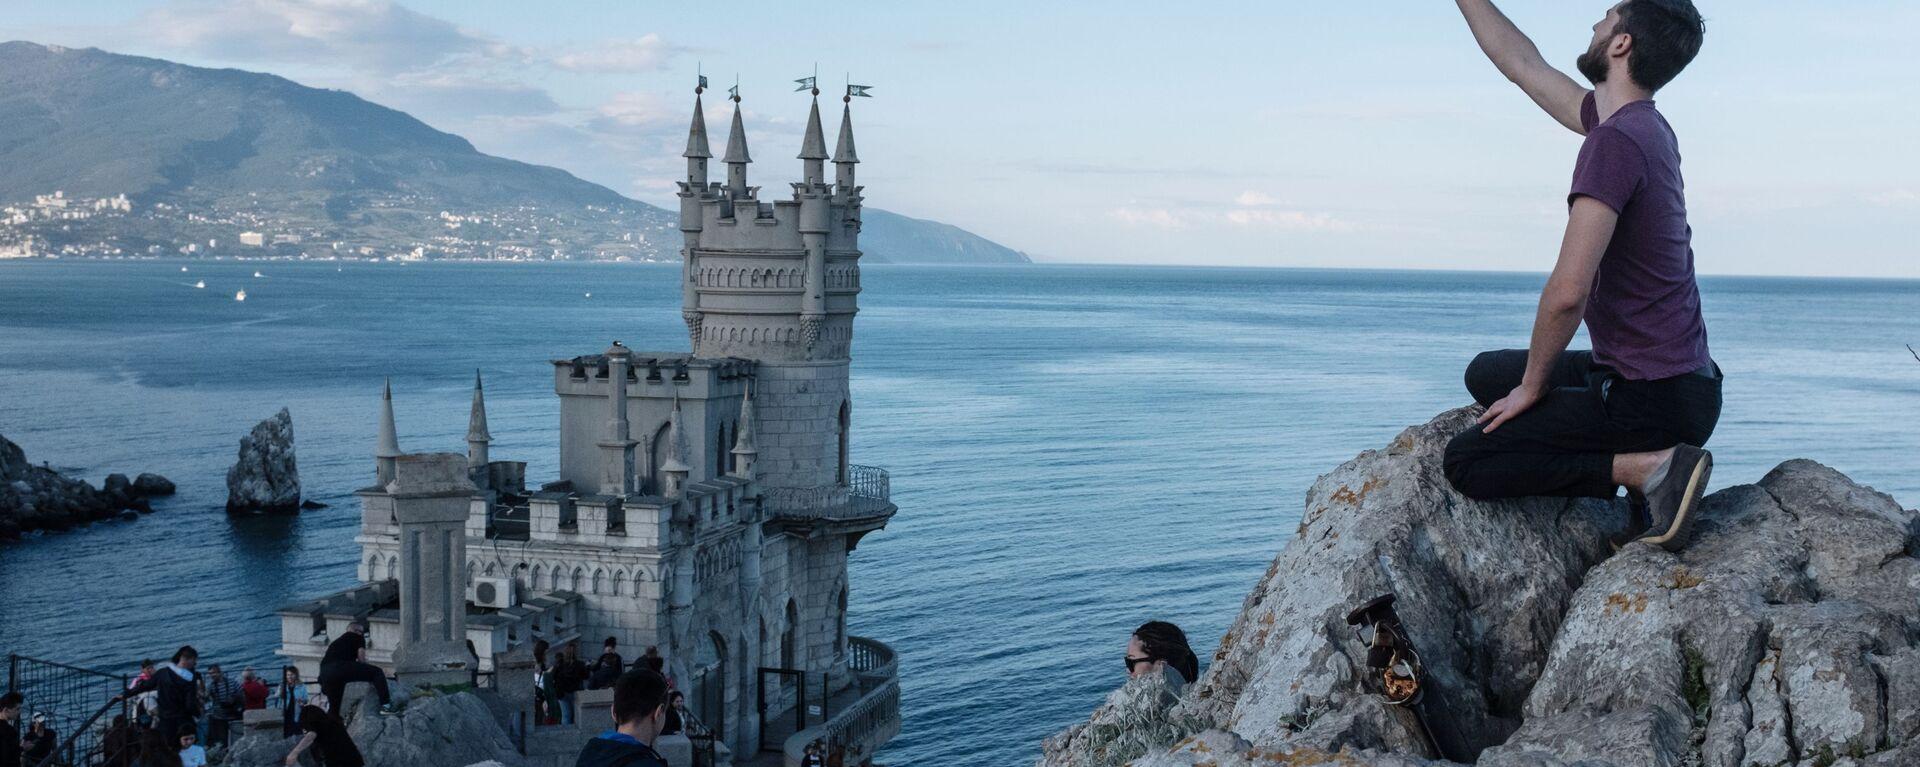 Krym morze czarne - Sputnik Polska, 1920, 06.09.2021